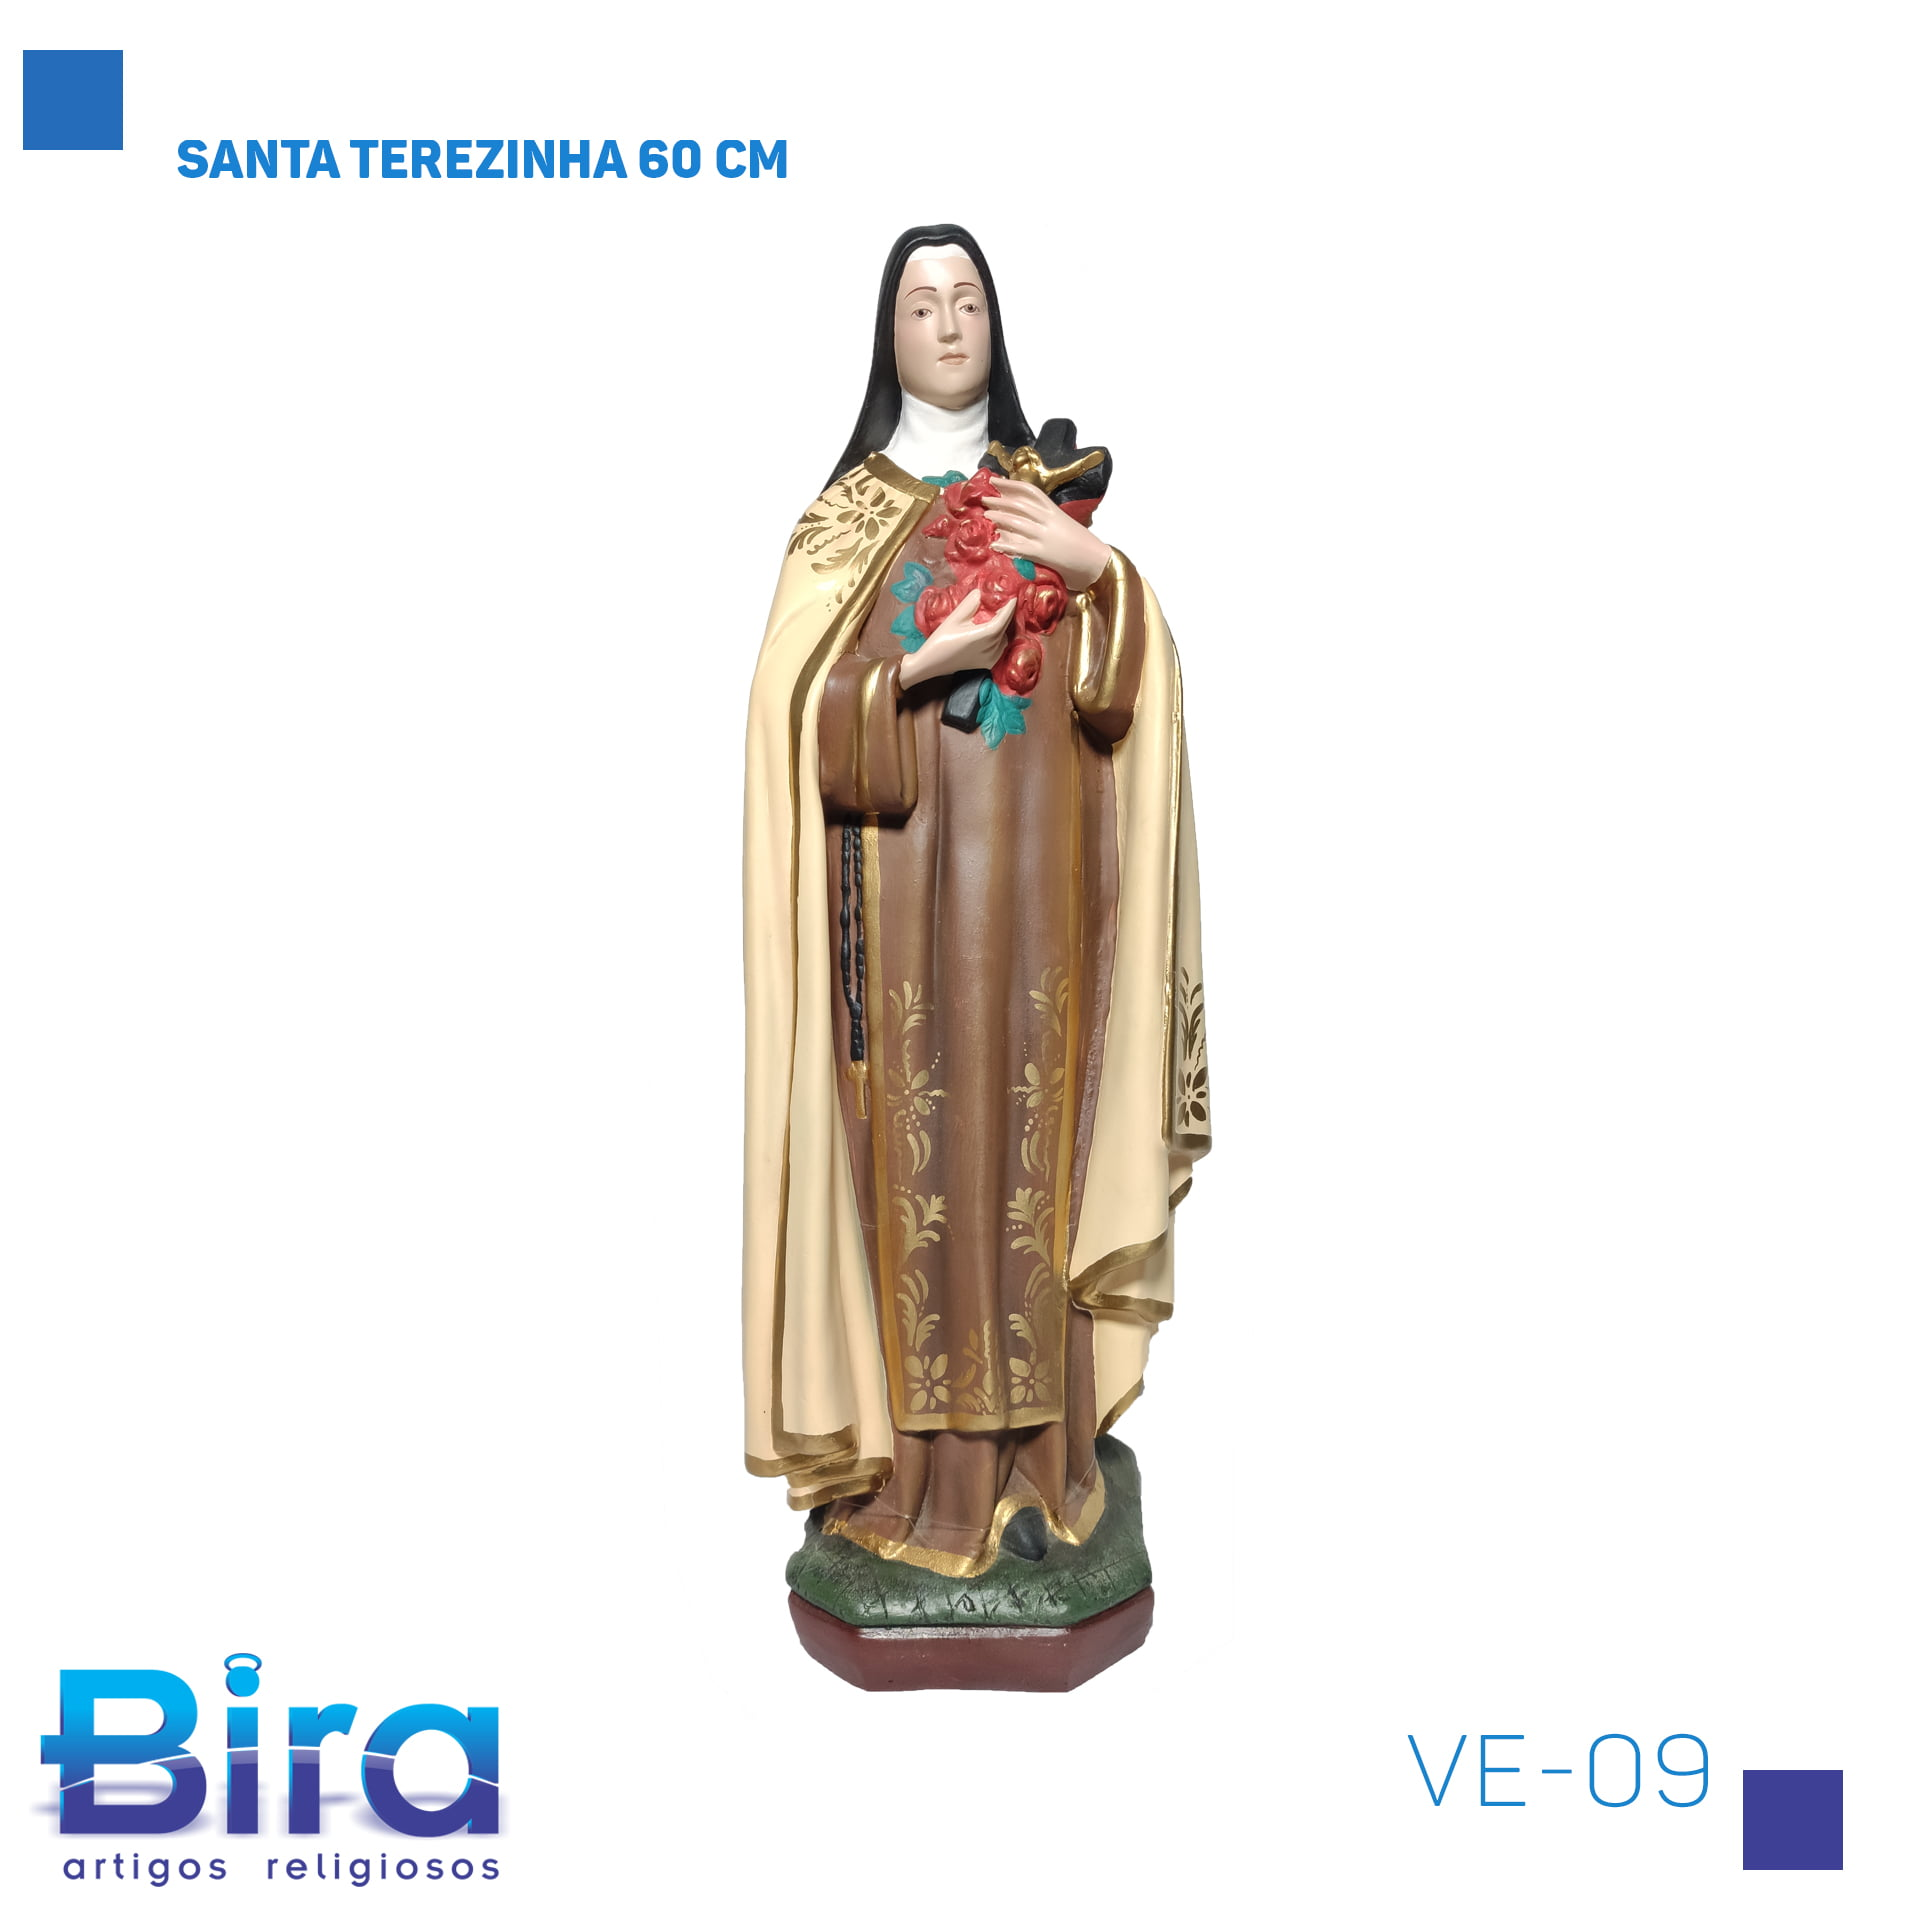 Bira Artigos Religiosos - SANTA TEREZINHA 60 CM Cód. VE-09